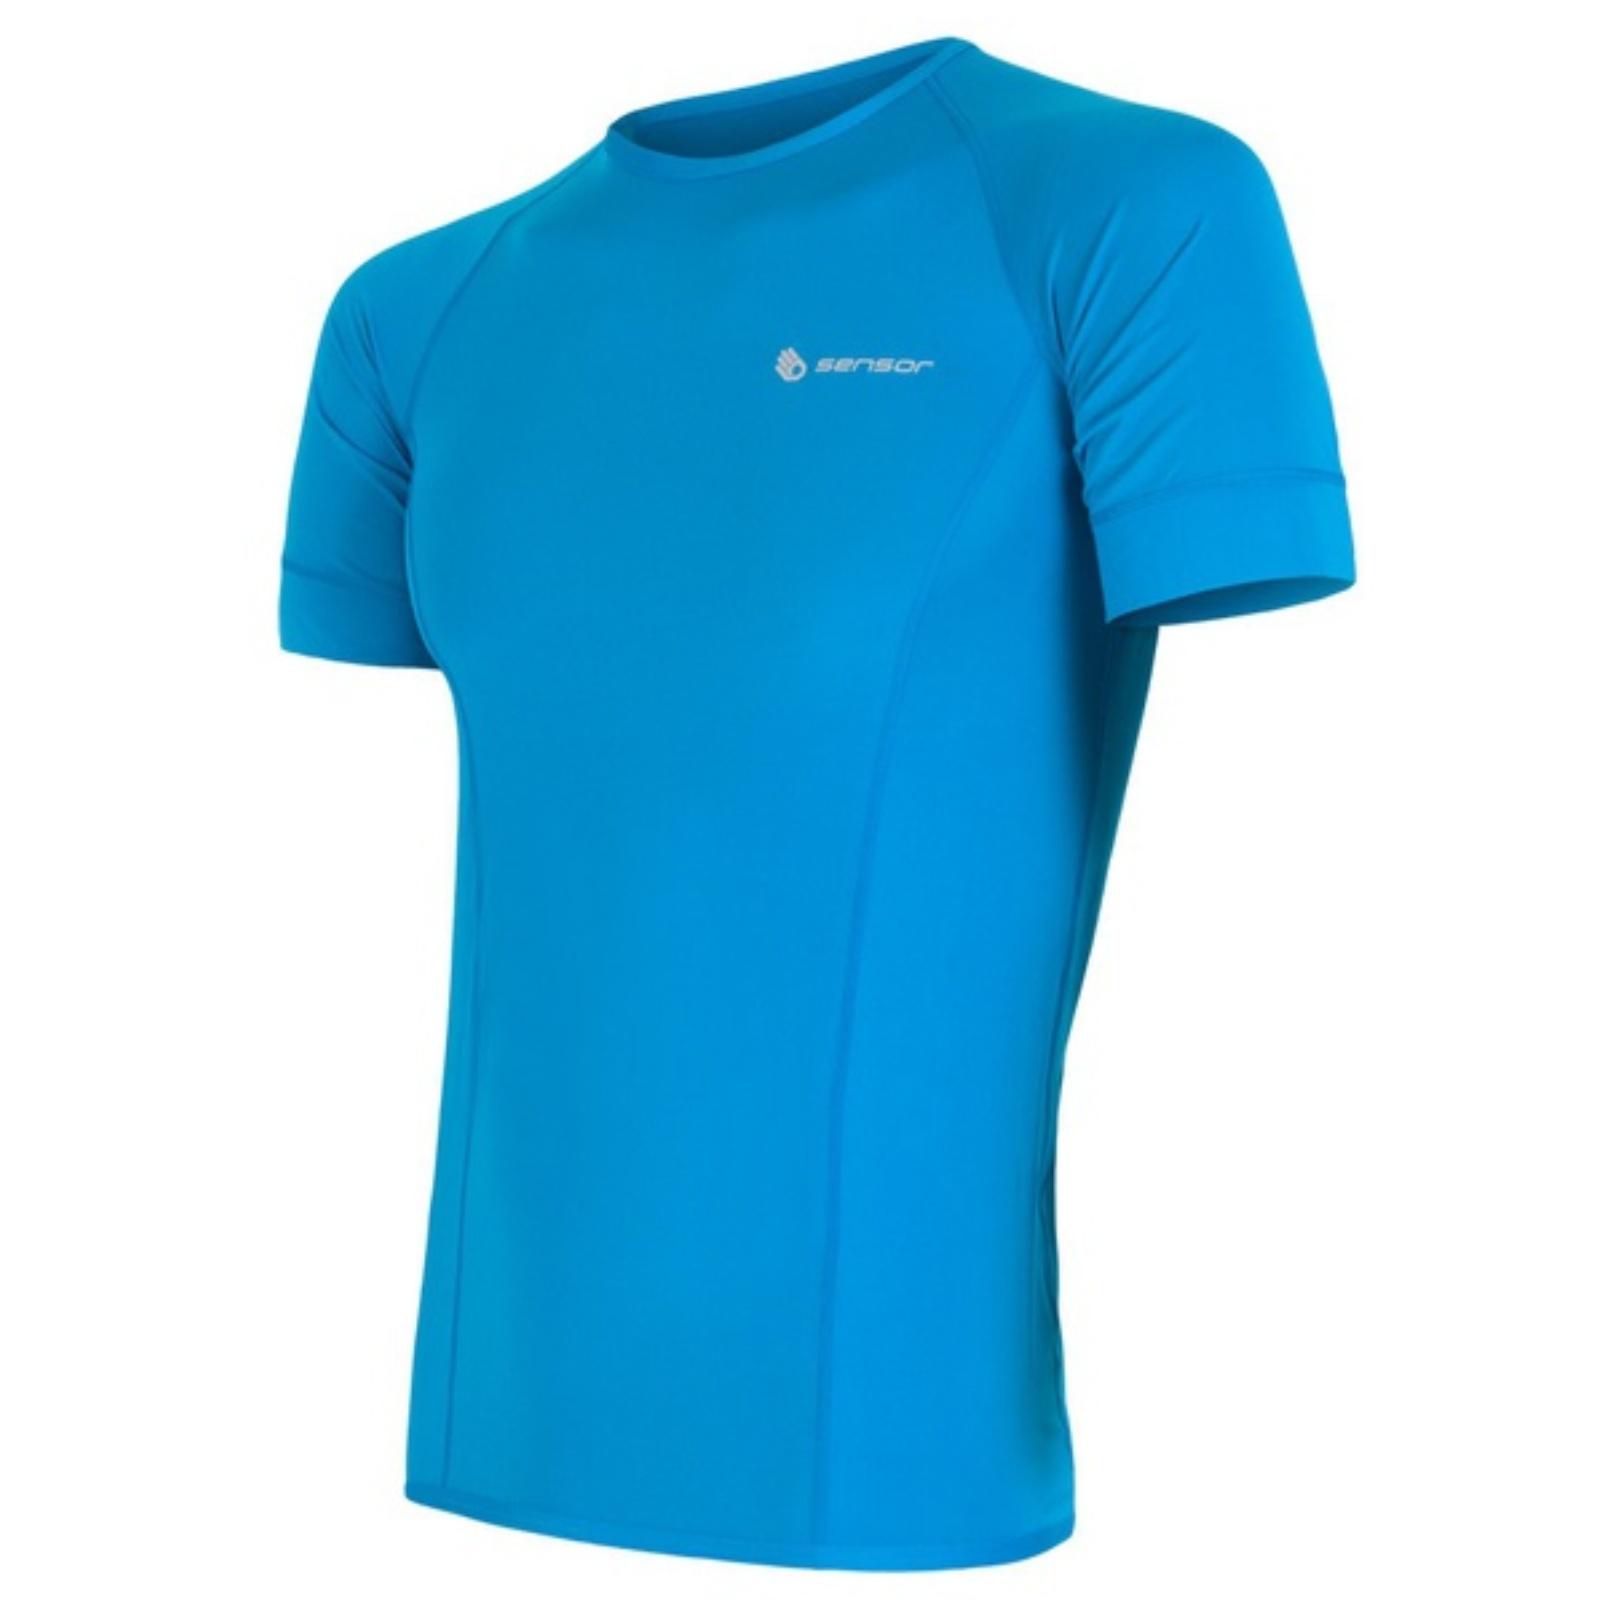 Triko krátký rukáv SENSOR Coolmax Fresh pánské modré